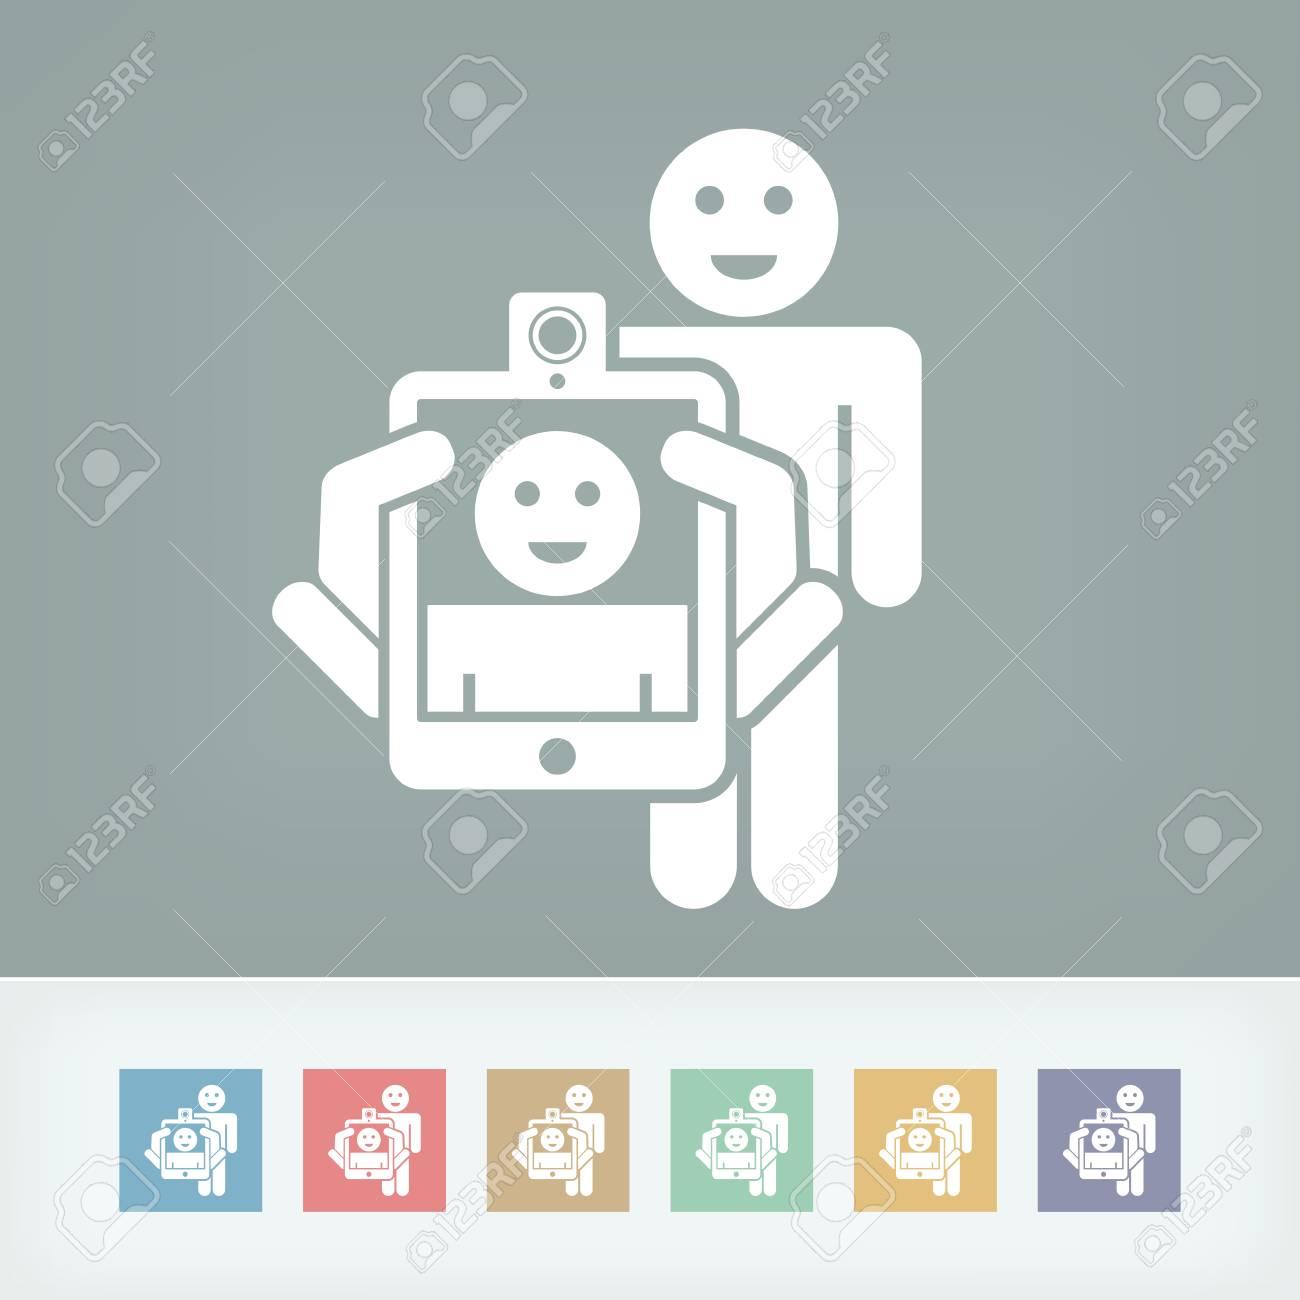 Smartphone or tablet photo digital portrait shoot Stock Vector - 27148864